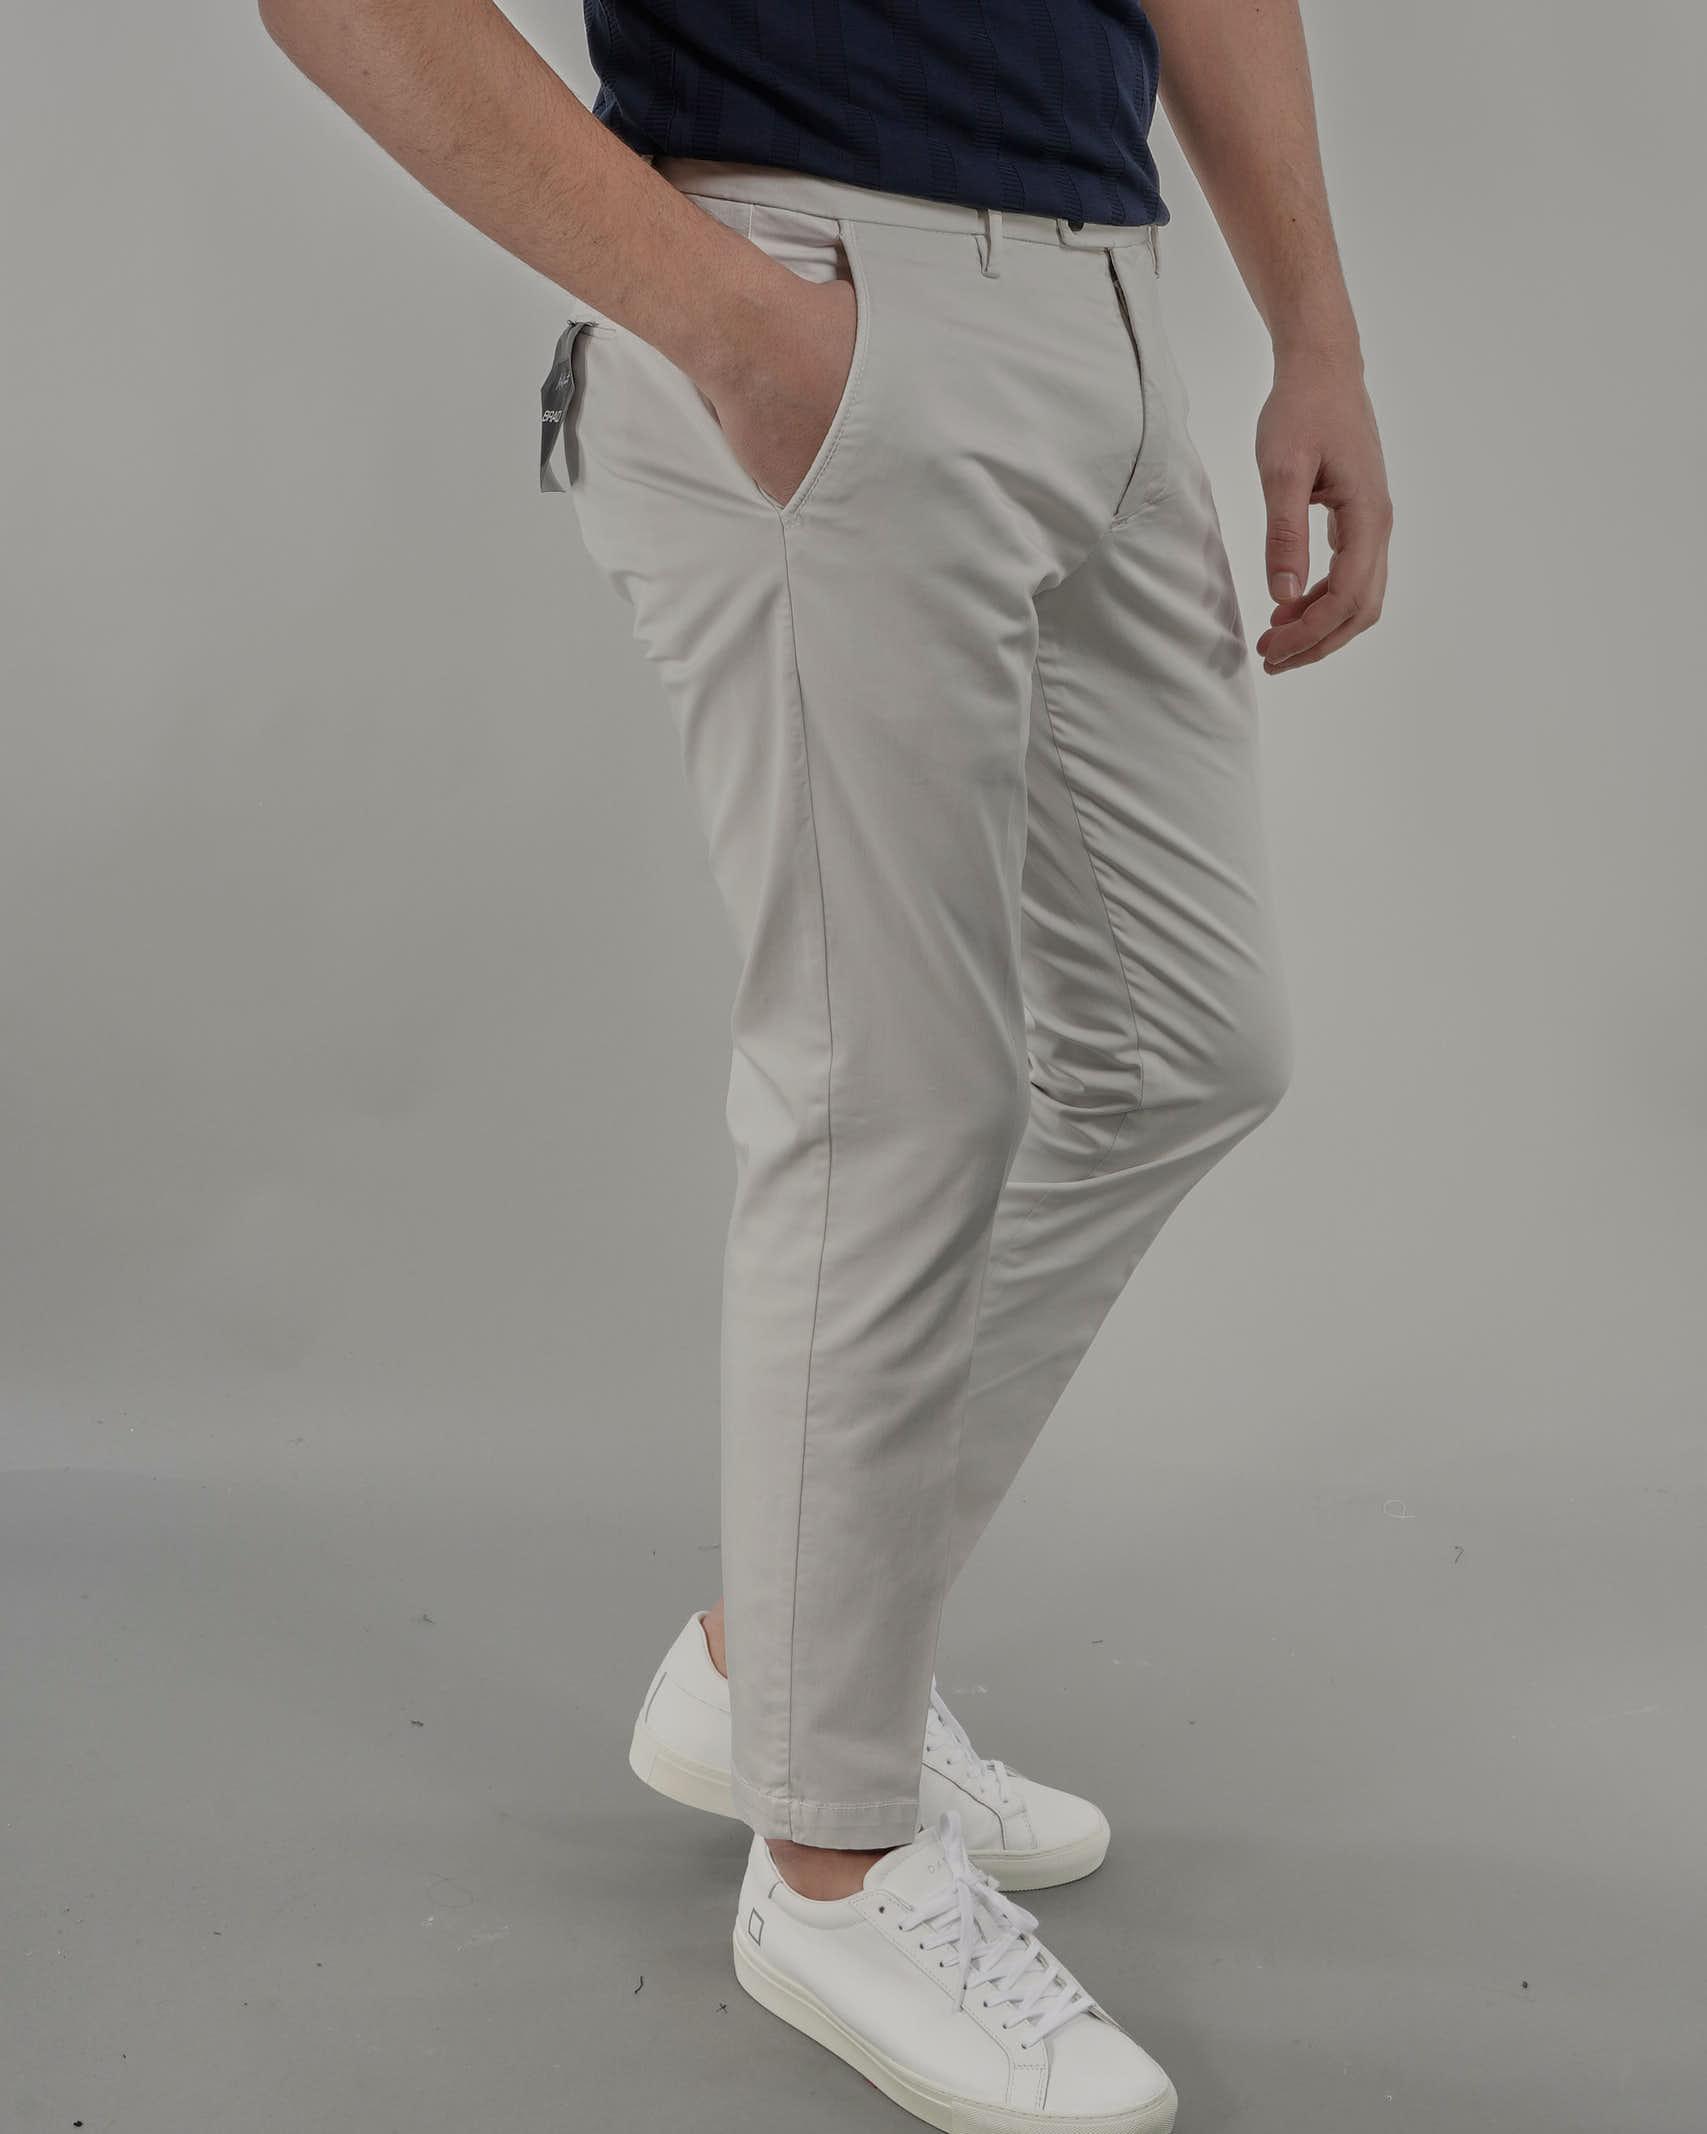 Pantalone in cotone Michael Coal MICHAEL COAL | Pantalone | BRAMDS2564PANNA